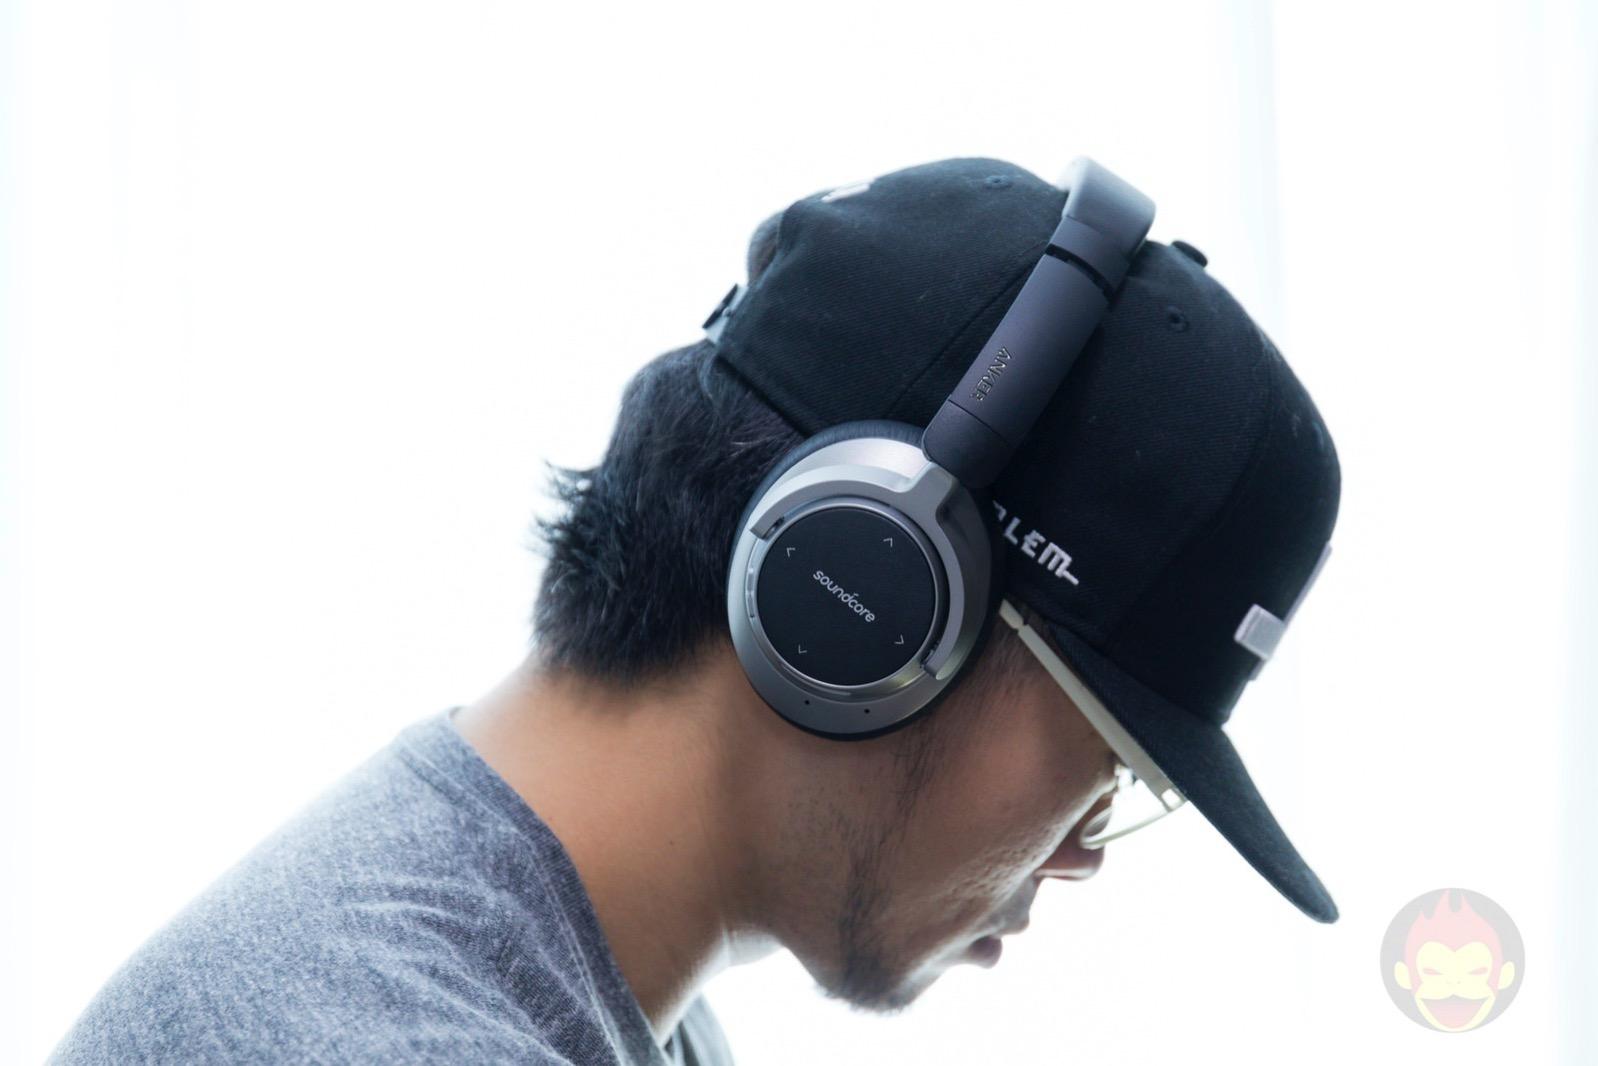 Soundcore-Space-NC-Wireless-Headphones-20.jpg